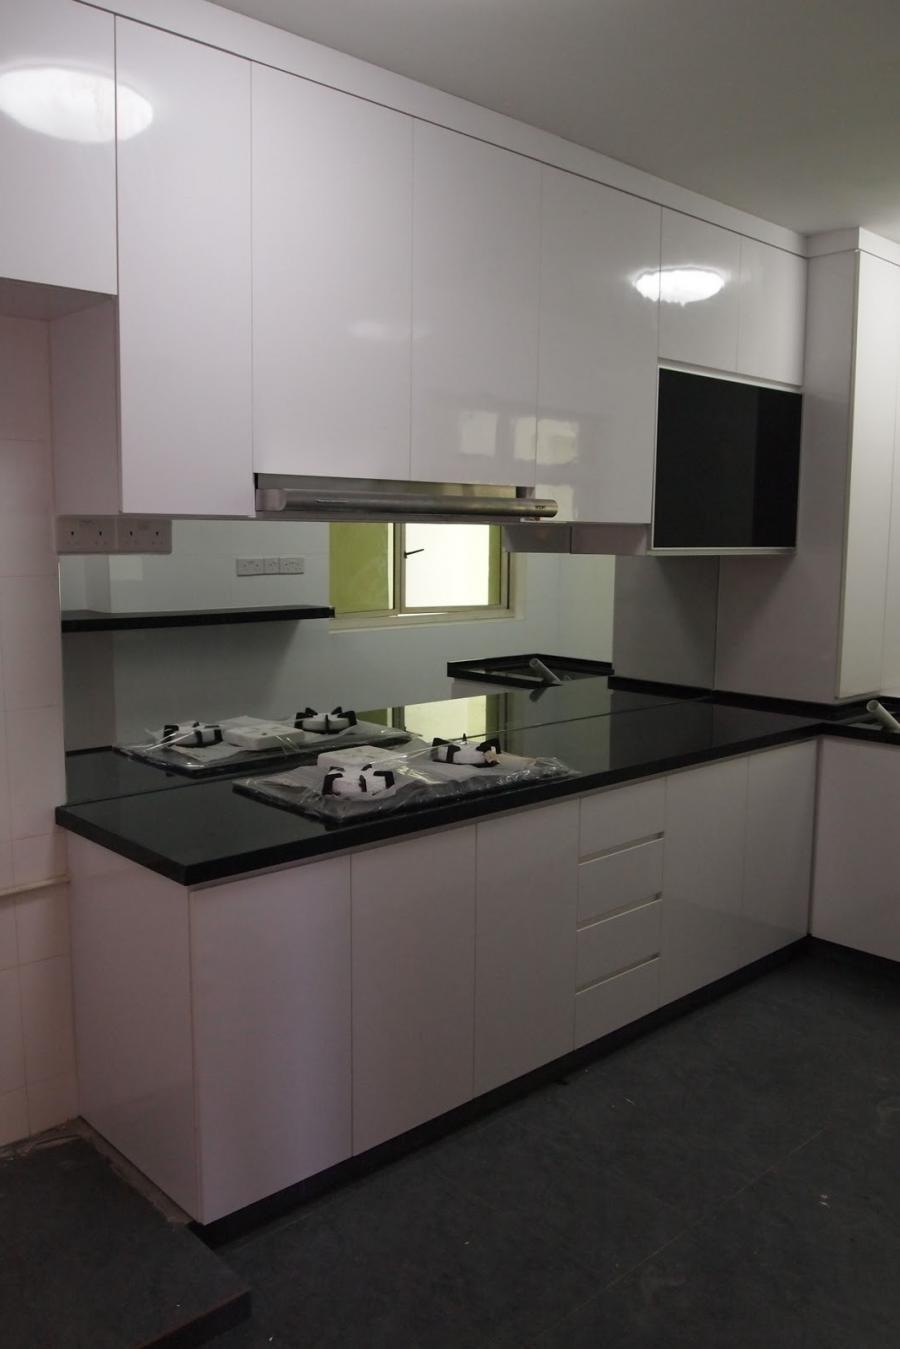 Kitchen cabinet design singapore photo gallery for Kitchen designs singapore